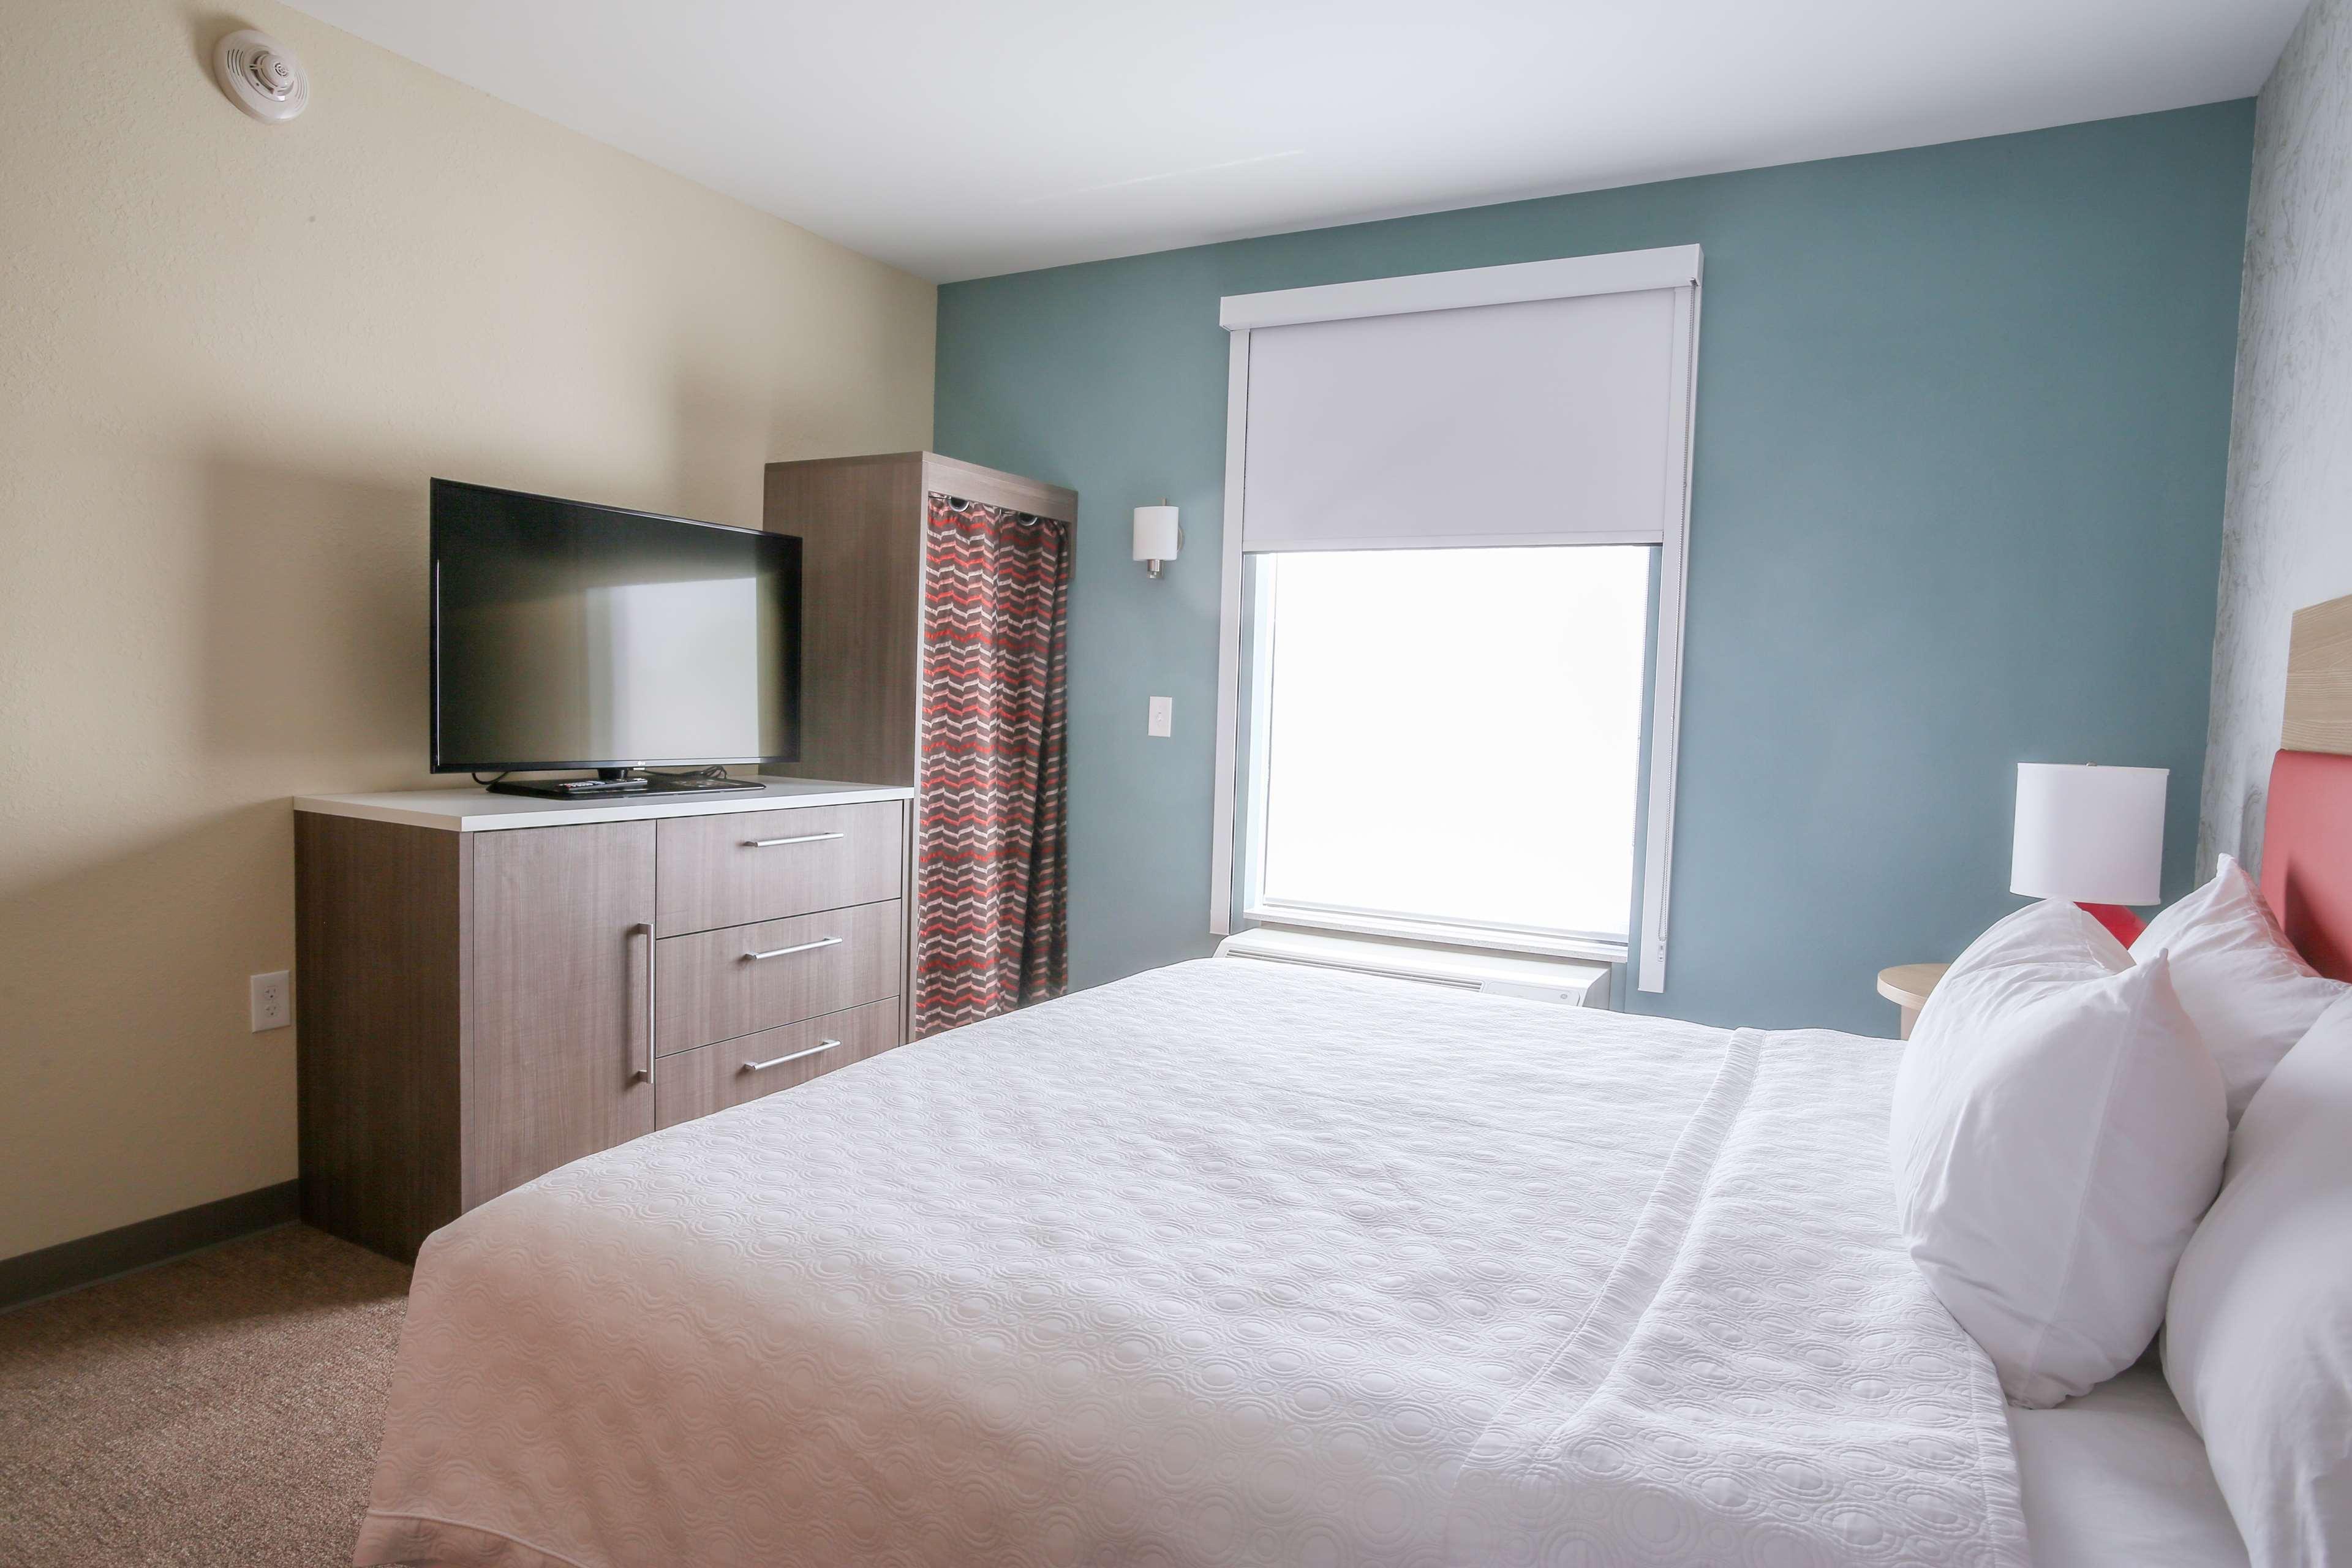 Home2 Suites by Hilton Bordentown image 23